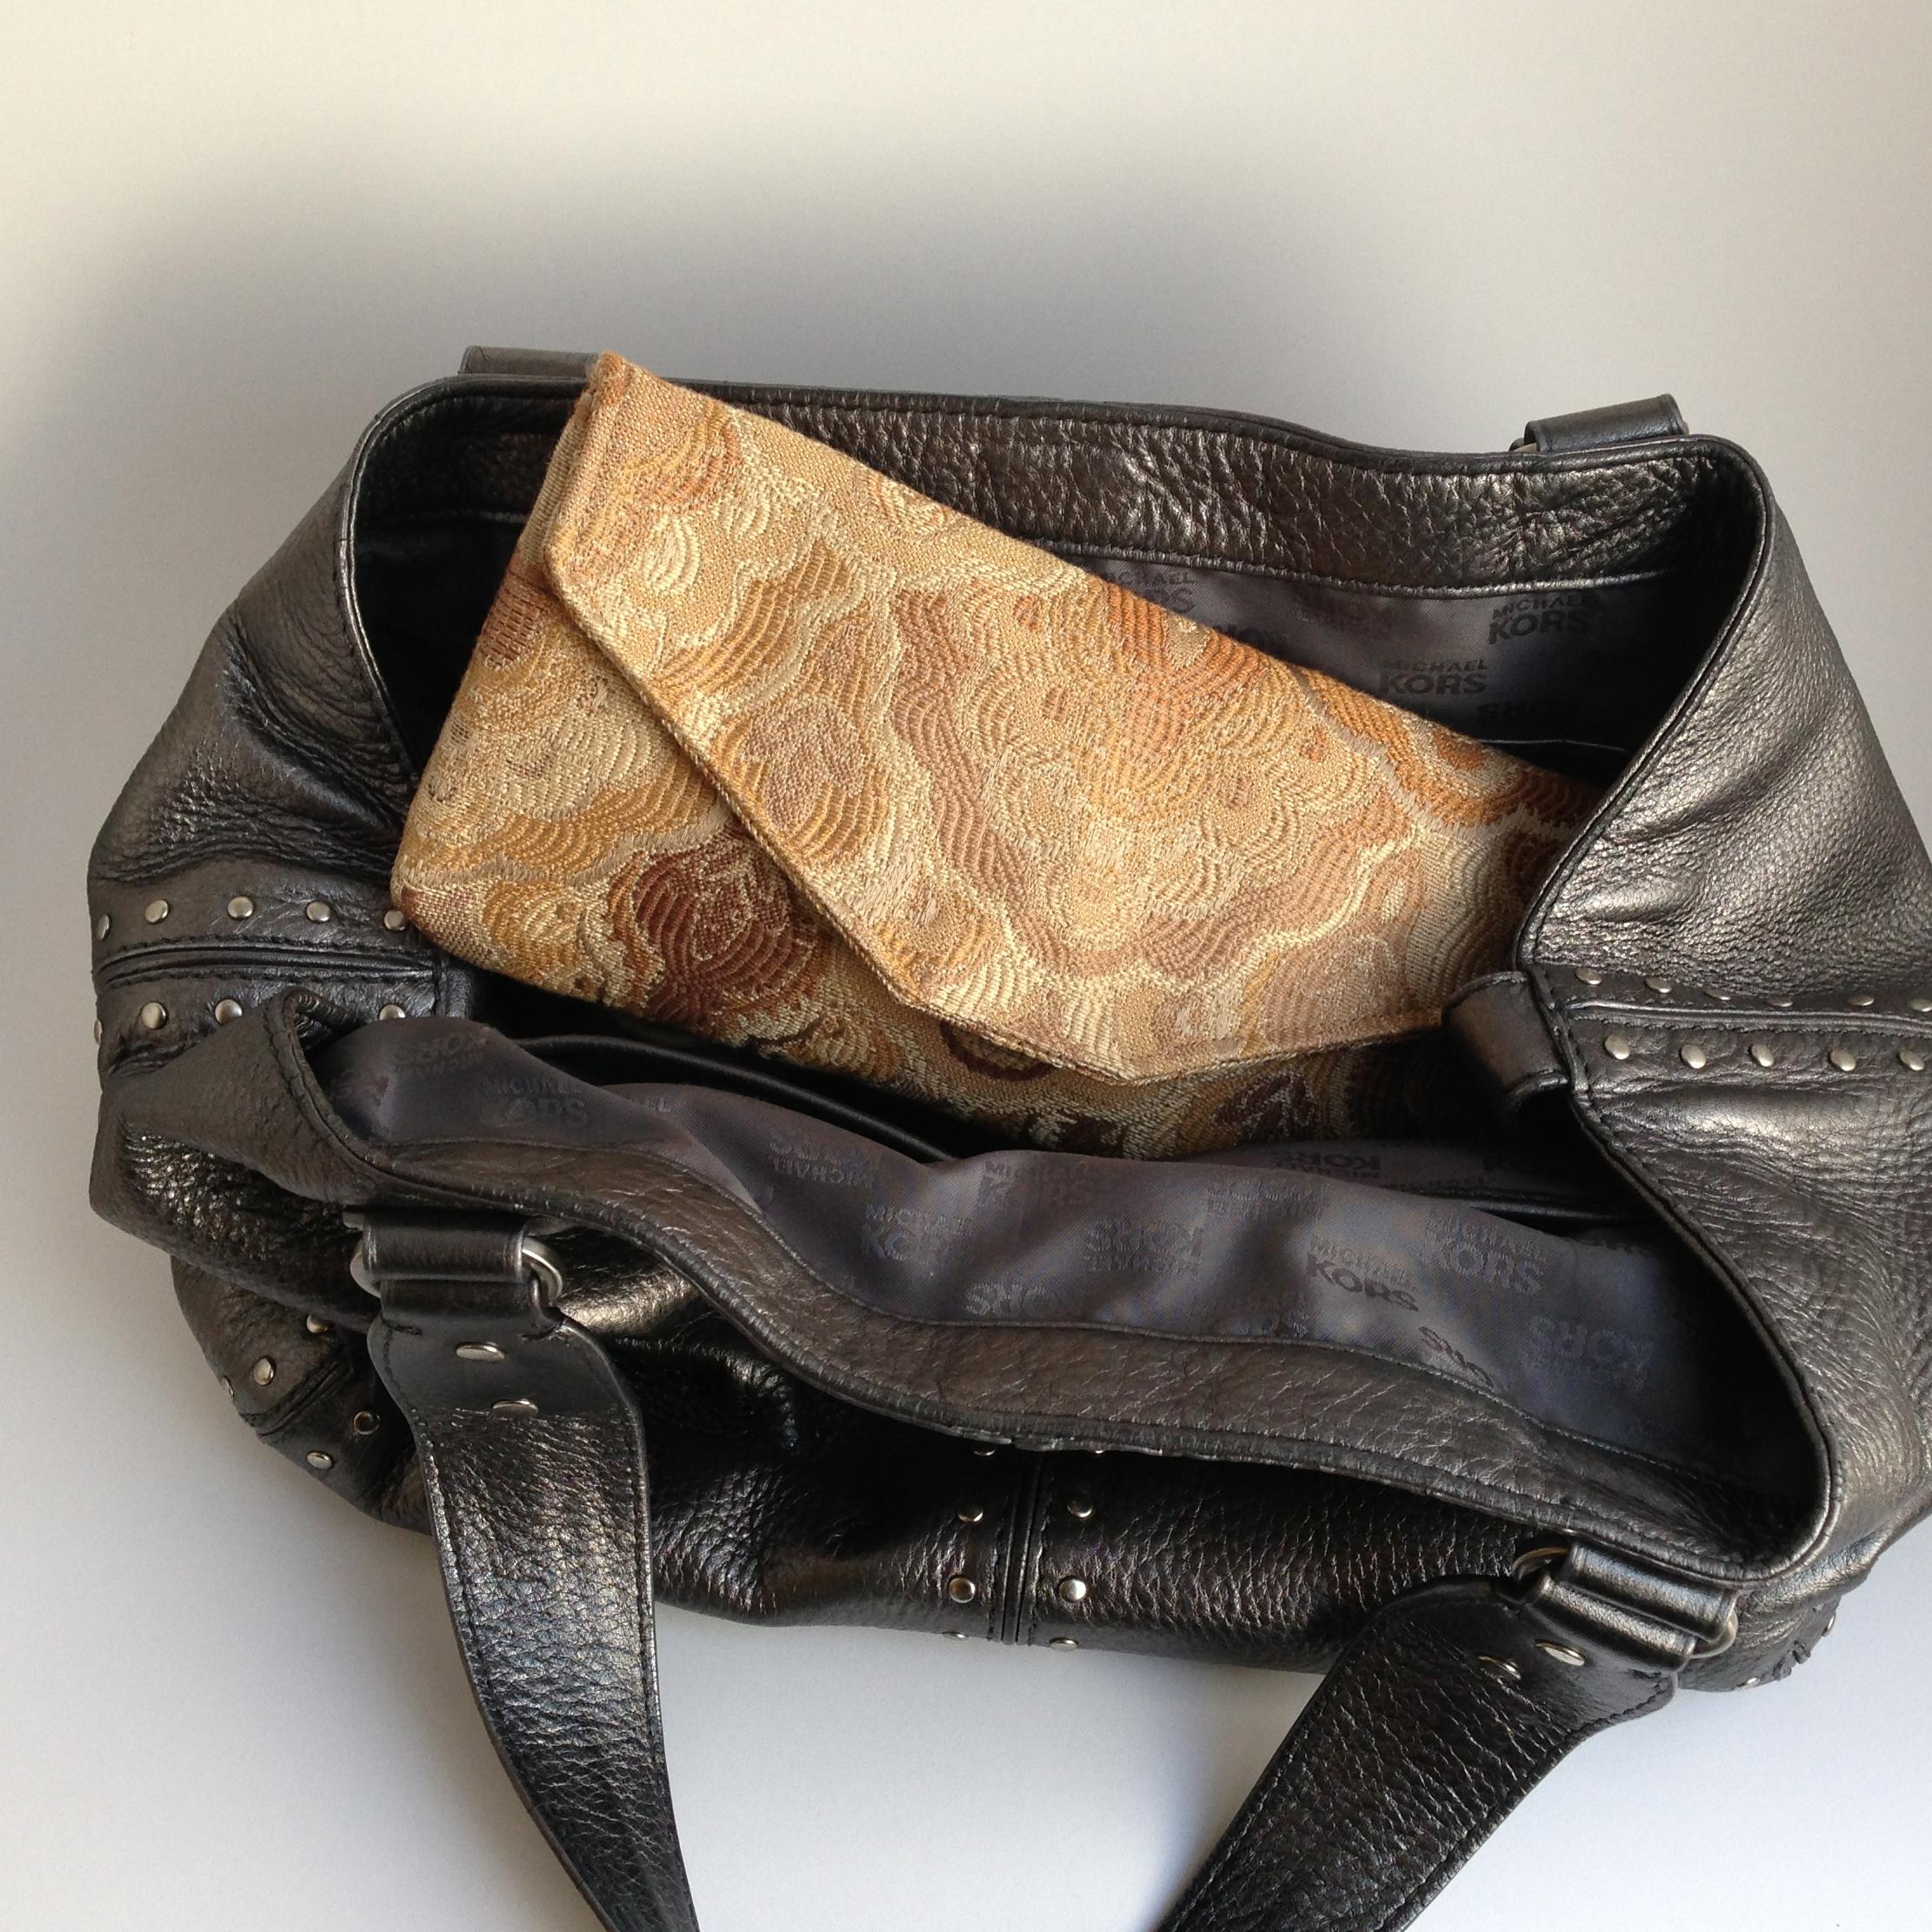 e.b.friday clutch as wallet